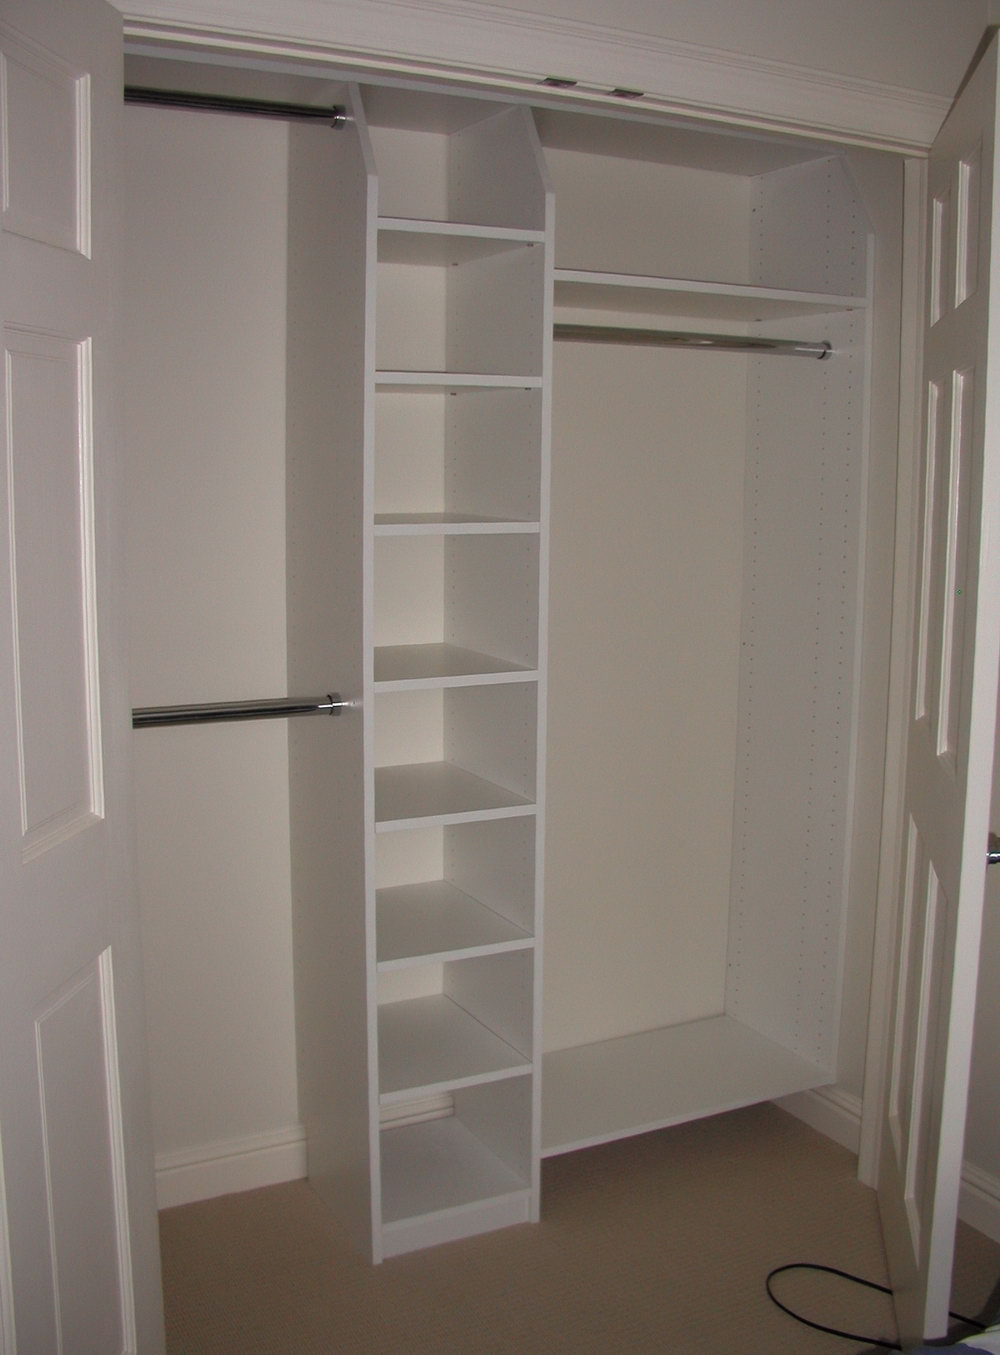 Closet Organizers Home Depot Do It Yourself